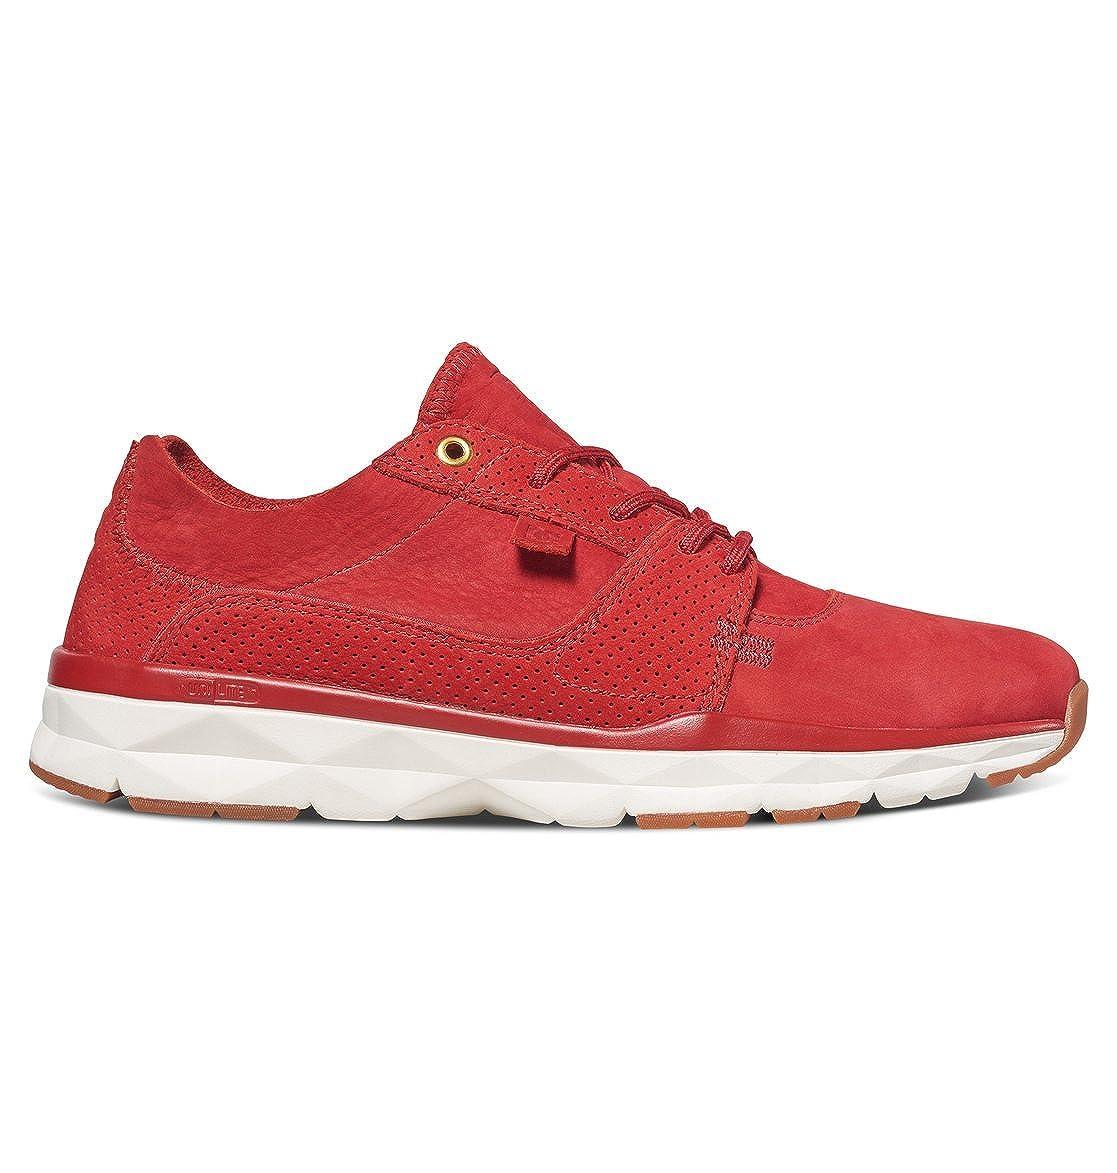 DC schuhe schuhe schuhe Player Zero - Schuhe für Männer ADYS600002 ca3b5b